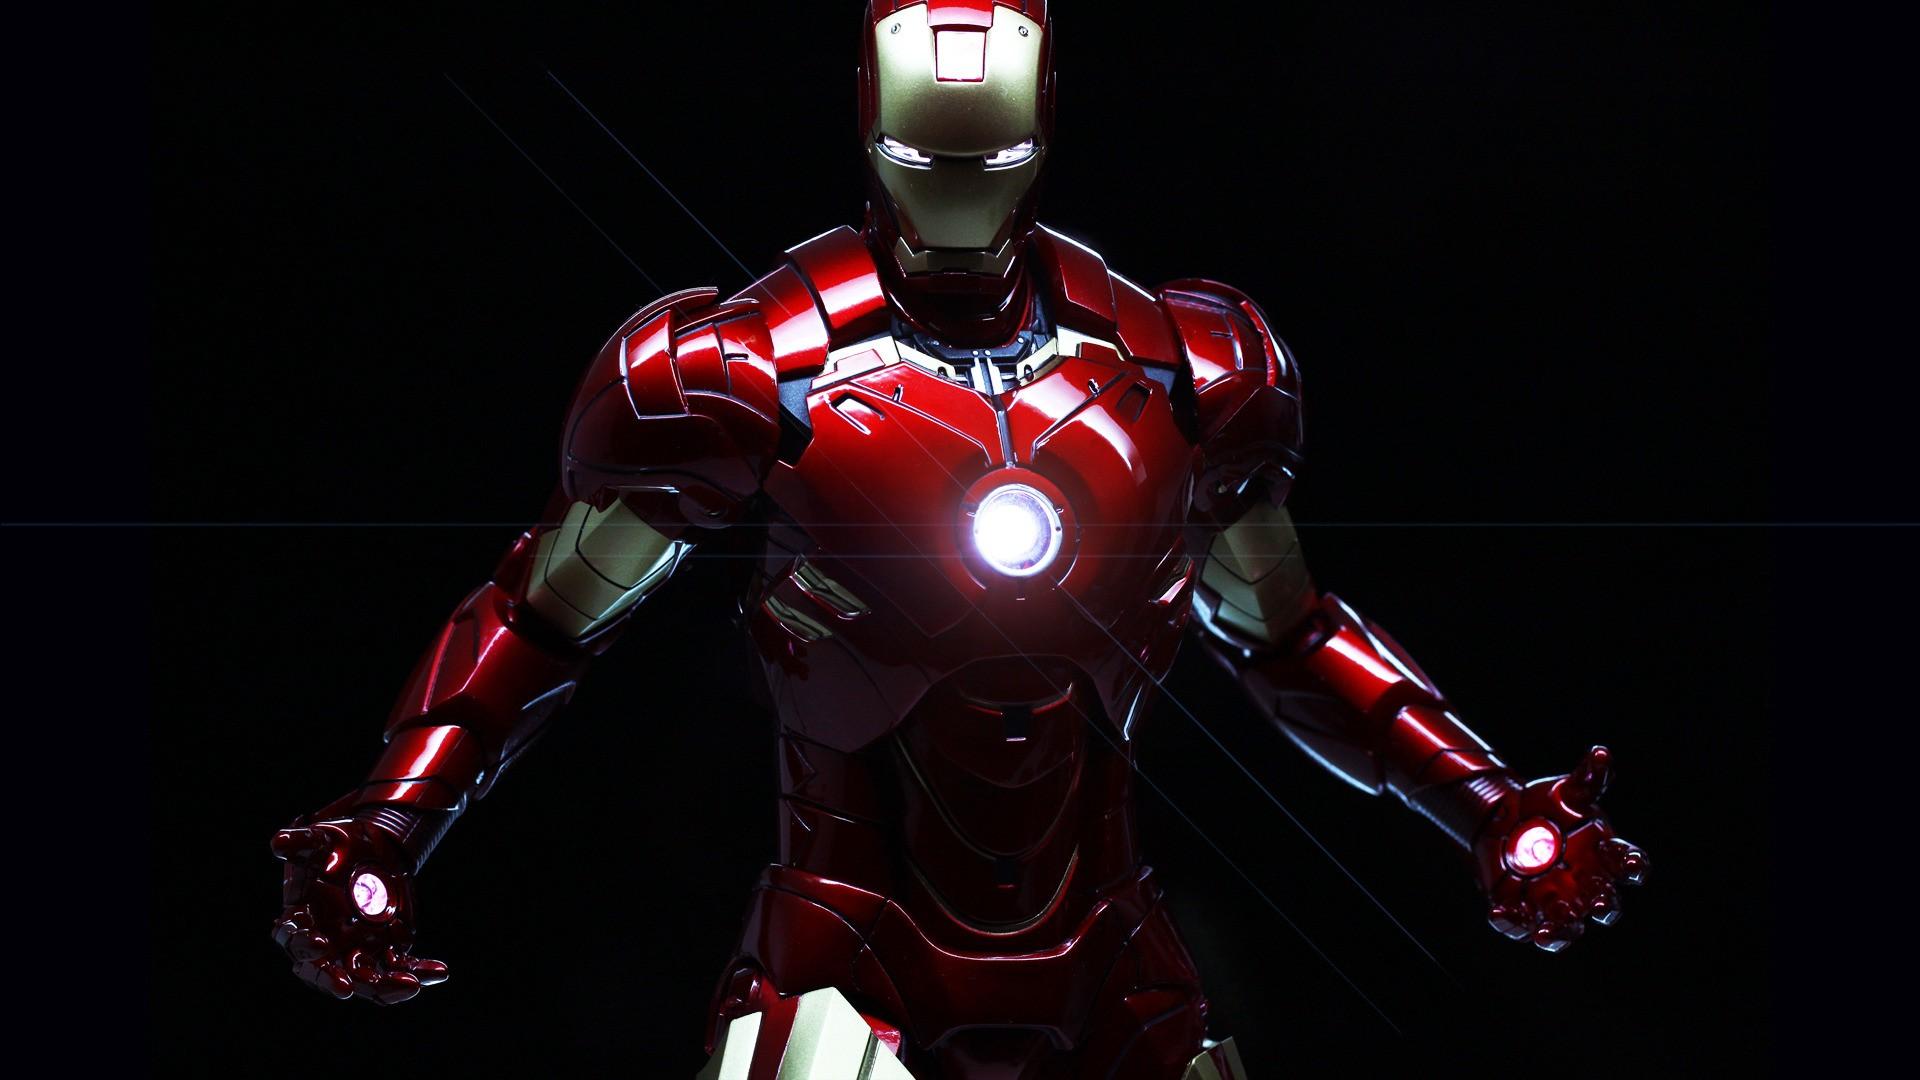 High Resolution Superhero Iron Man Wallpaper HD   SiWallpaperHD 18890 1920x1080